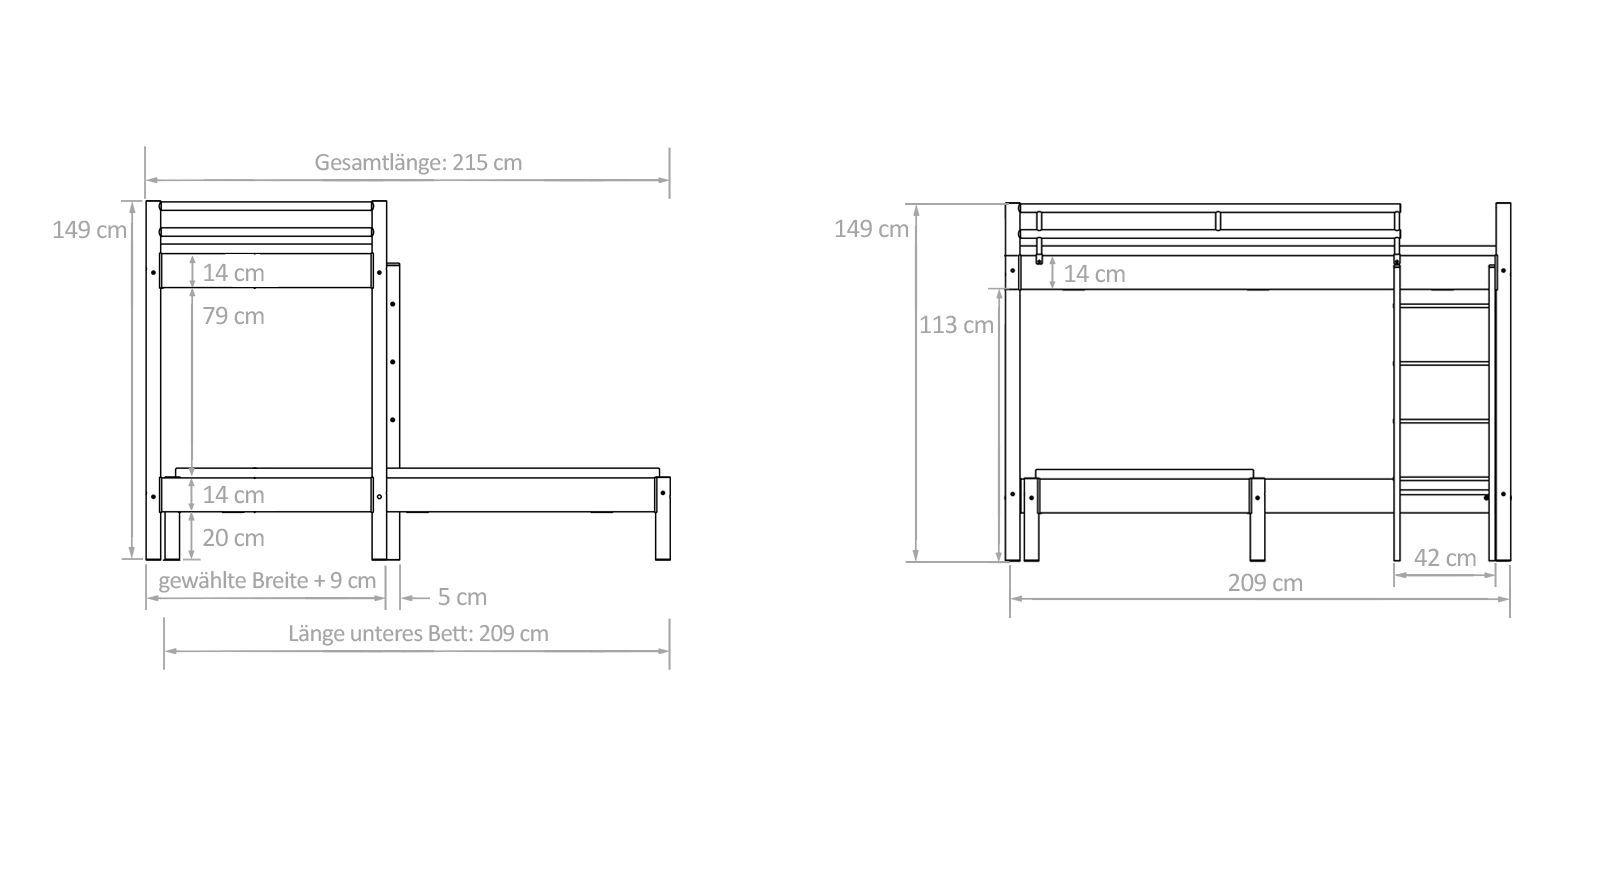 eck etagenbett simple hasena midi buche cm mit treppe with eck etagenbett latest justyou tom. Black Bedroom Furniture Sets. Home Design Ideas